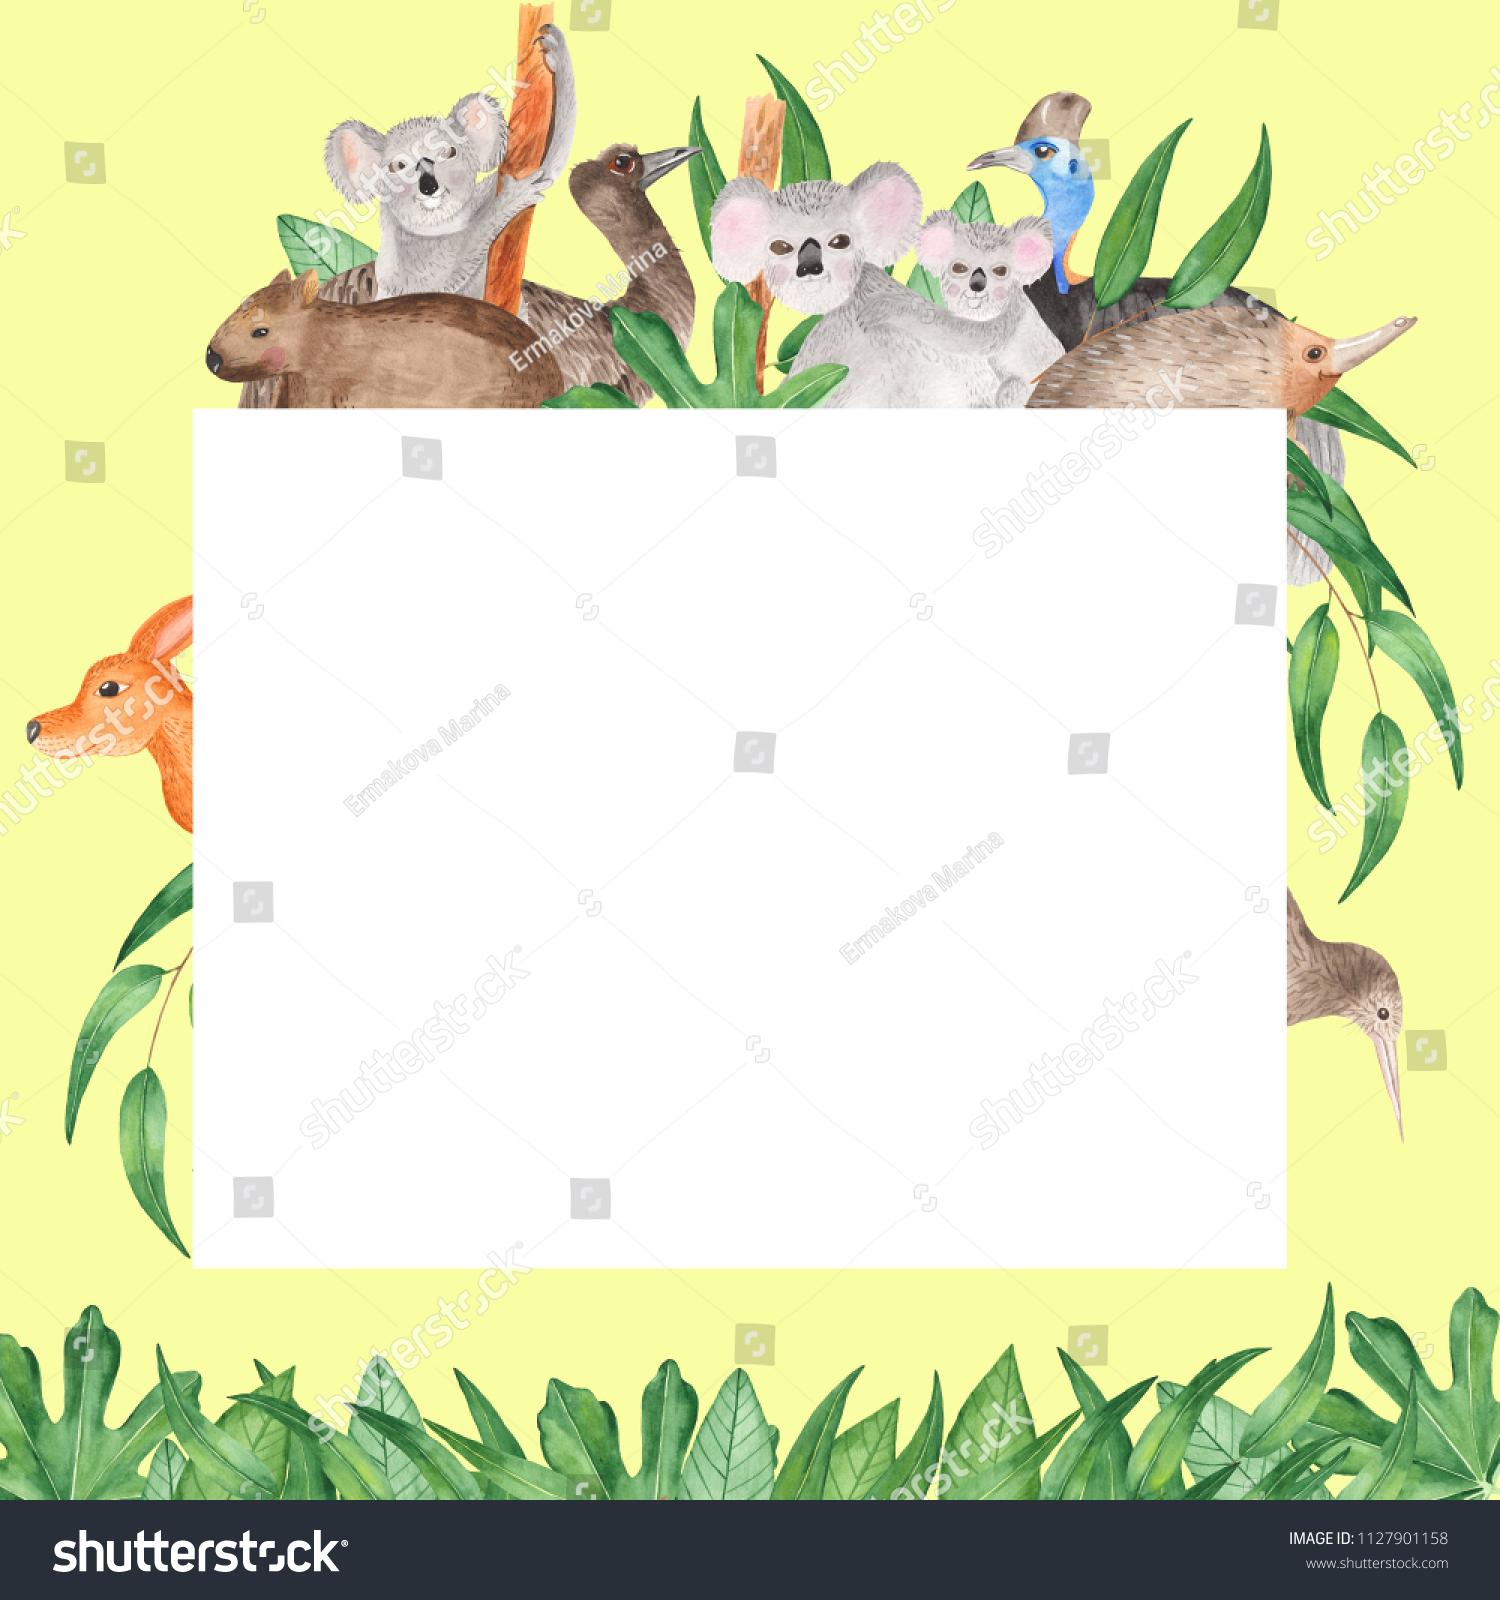 Watercolor Card Australian Animals Sweet Invitation Stock ...